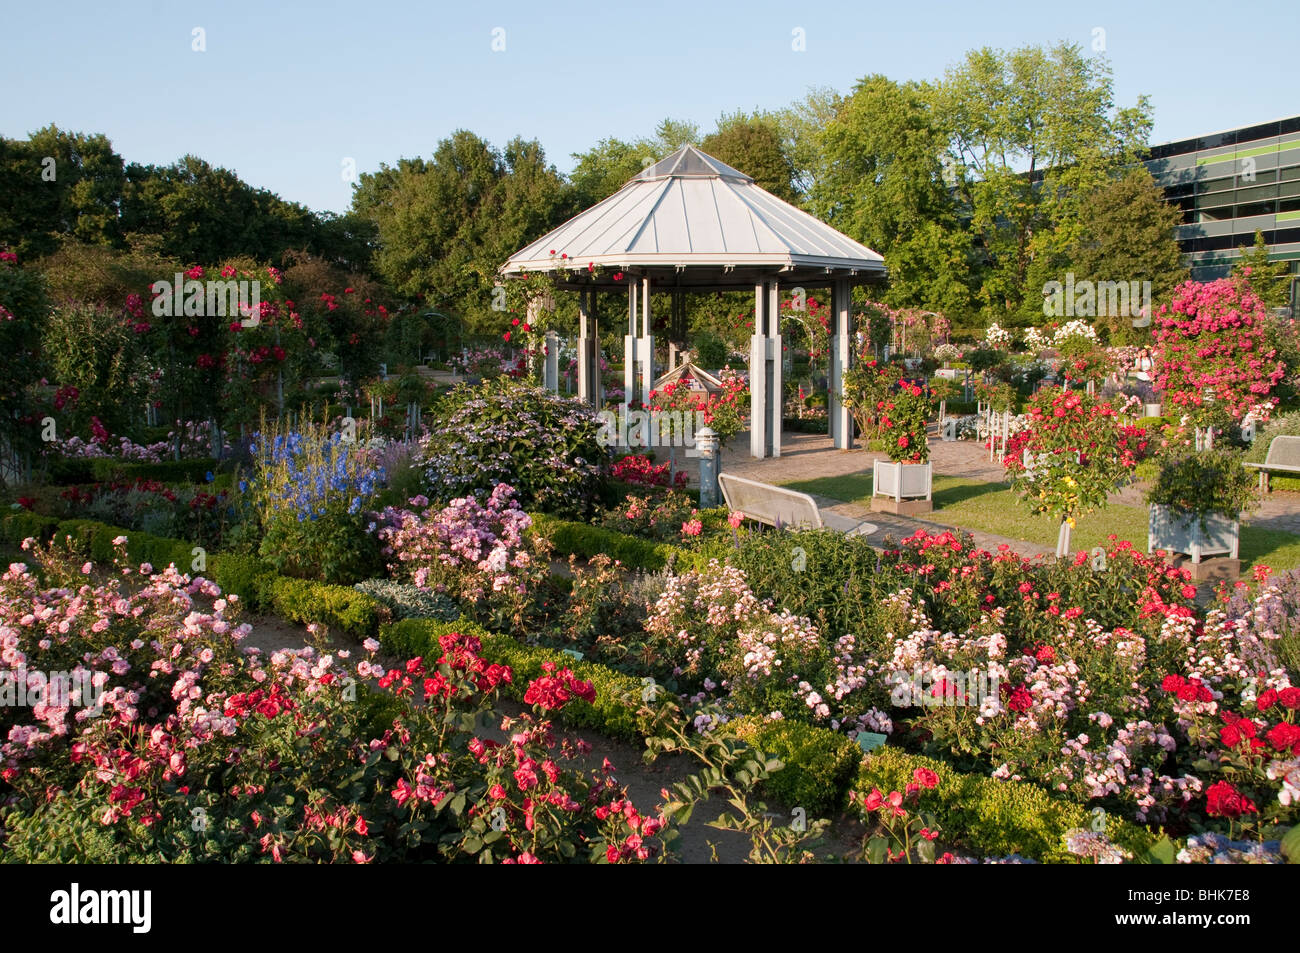 rosengarten mit pavillon planten un blomen hamburg. Black Bedroom Furniture Sets. Home Design Ideas